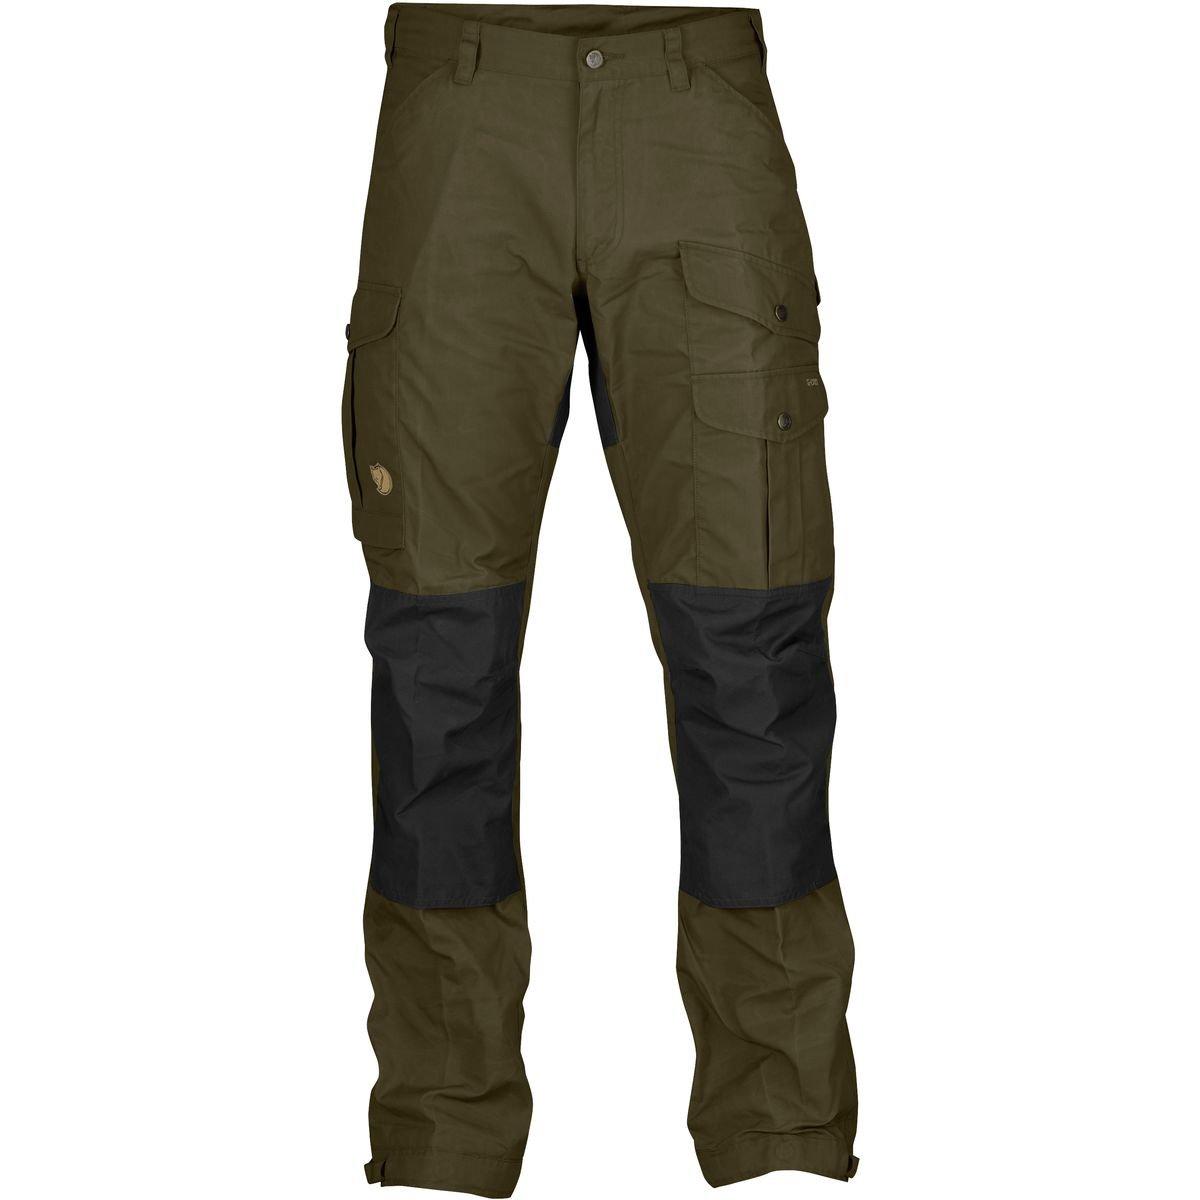 b69ecd89c99 Fjällräven 81760 - Pantalones de esquí para hombre on sale - www ...